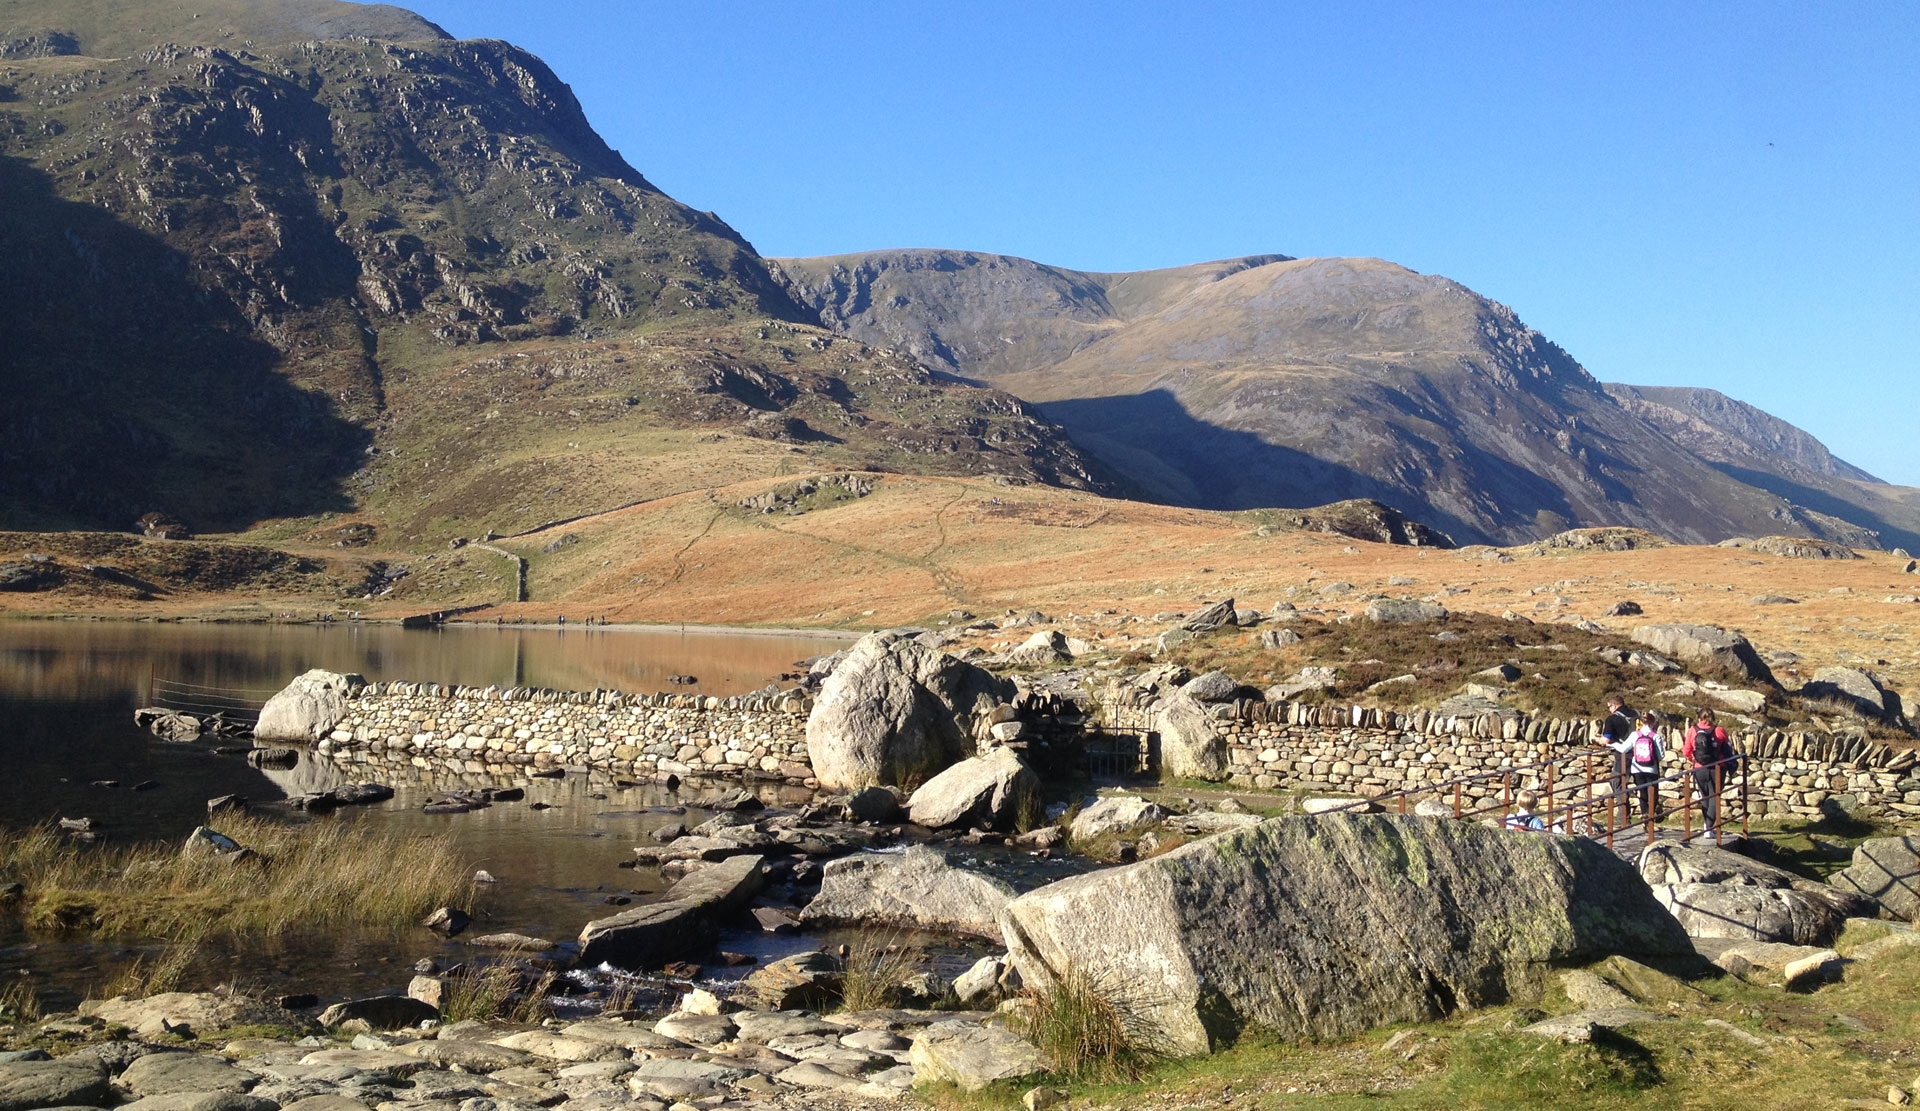 Tudor Lodge Porthmadog is the perfect base for Snowdonia National Park